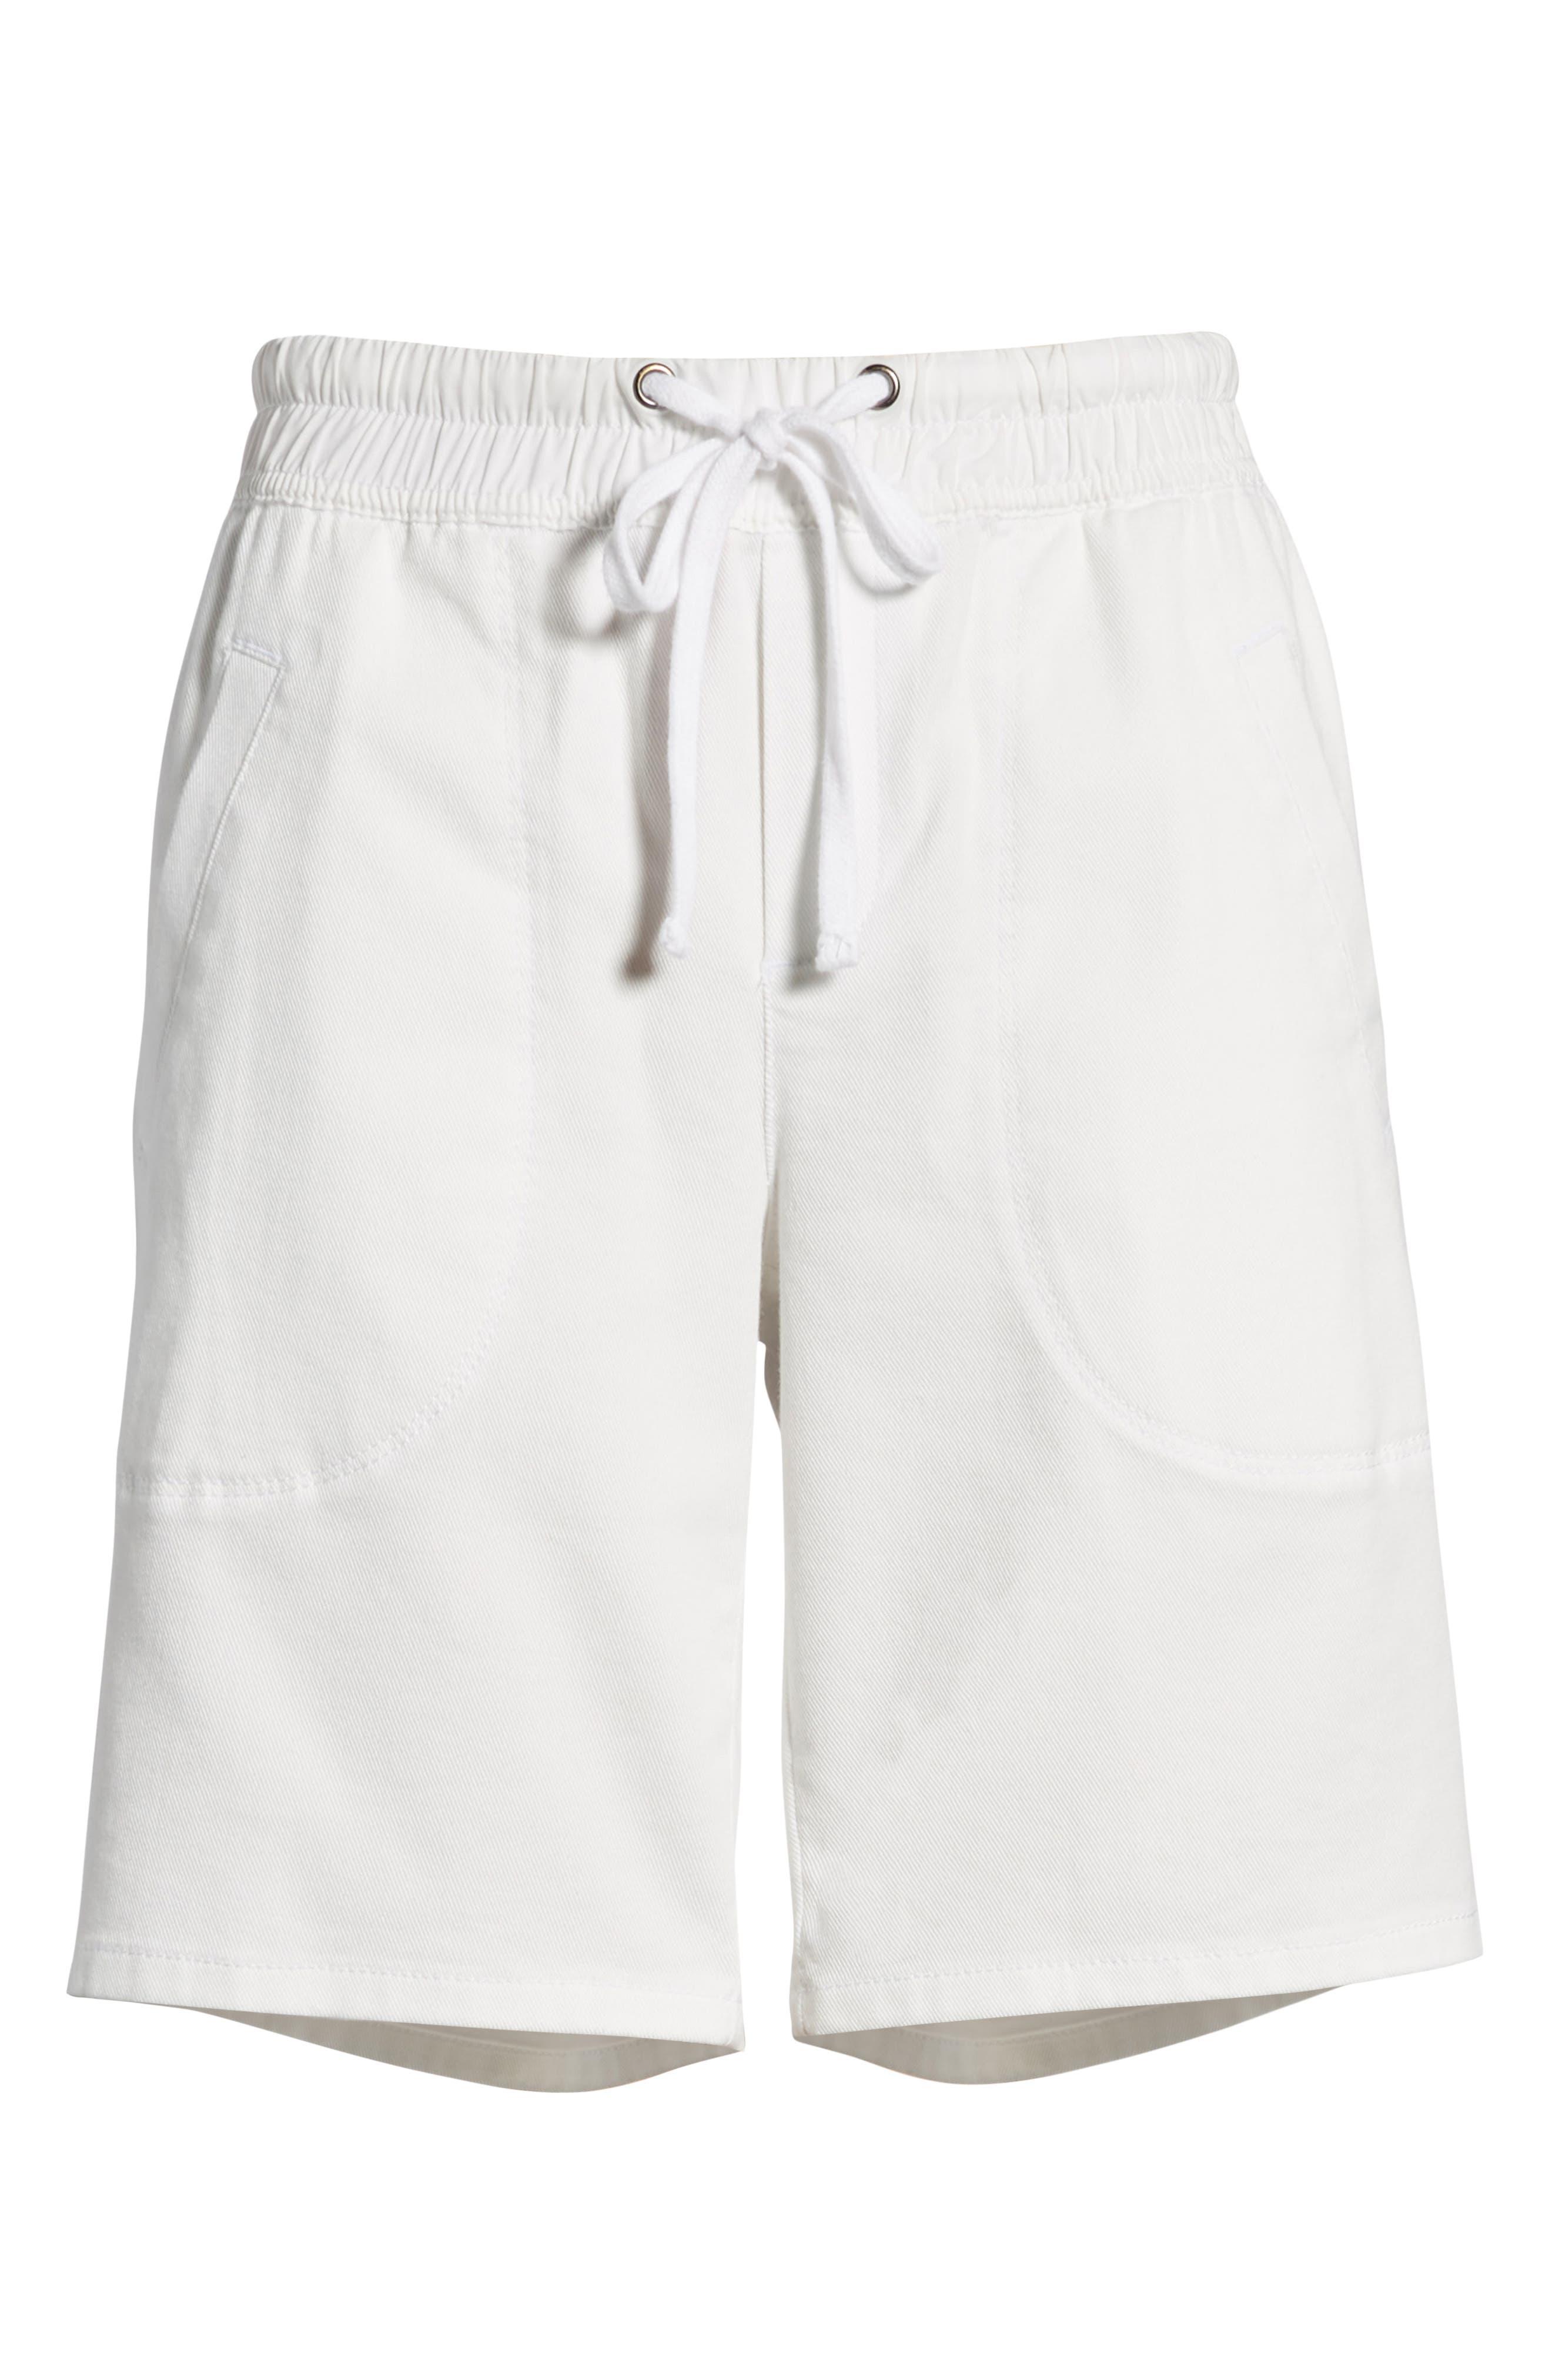 Open Road Drawstring Shorts,                             Alternate thumbnail 6, color,                             123